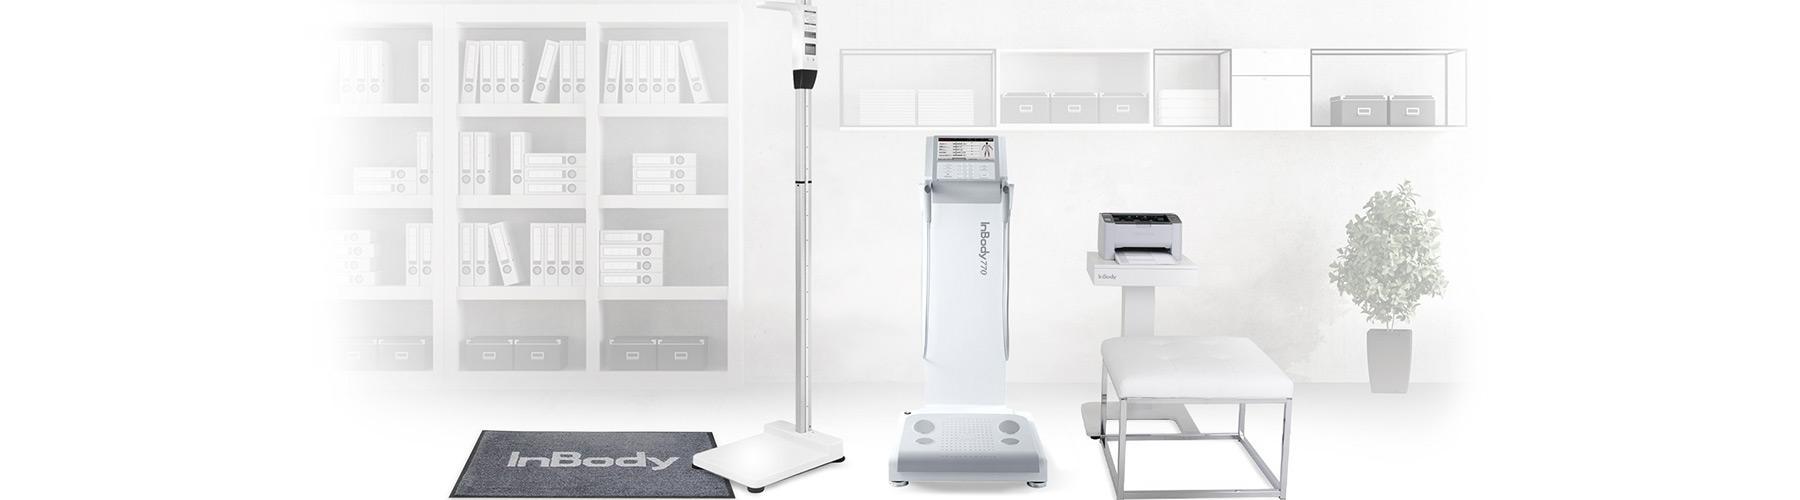 echipamente medicale, ecg, holter ecg, ekg, holter ekg